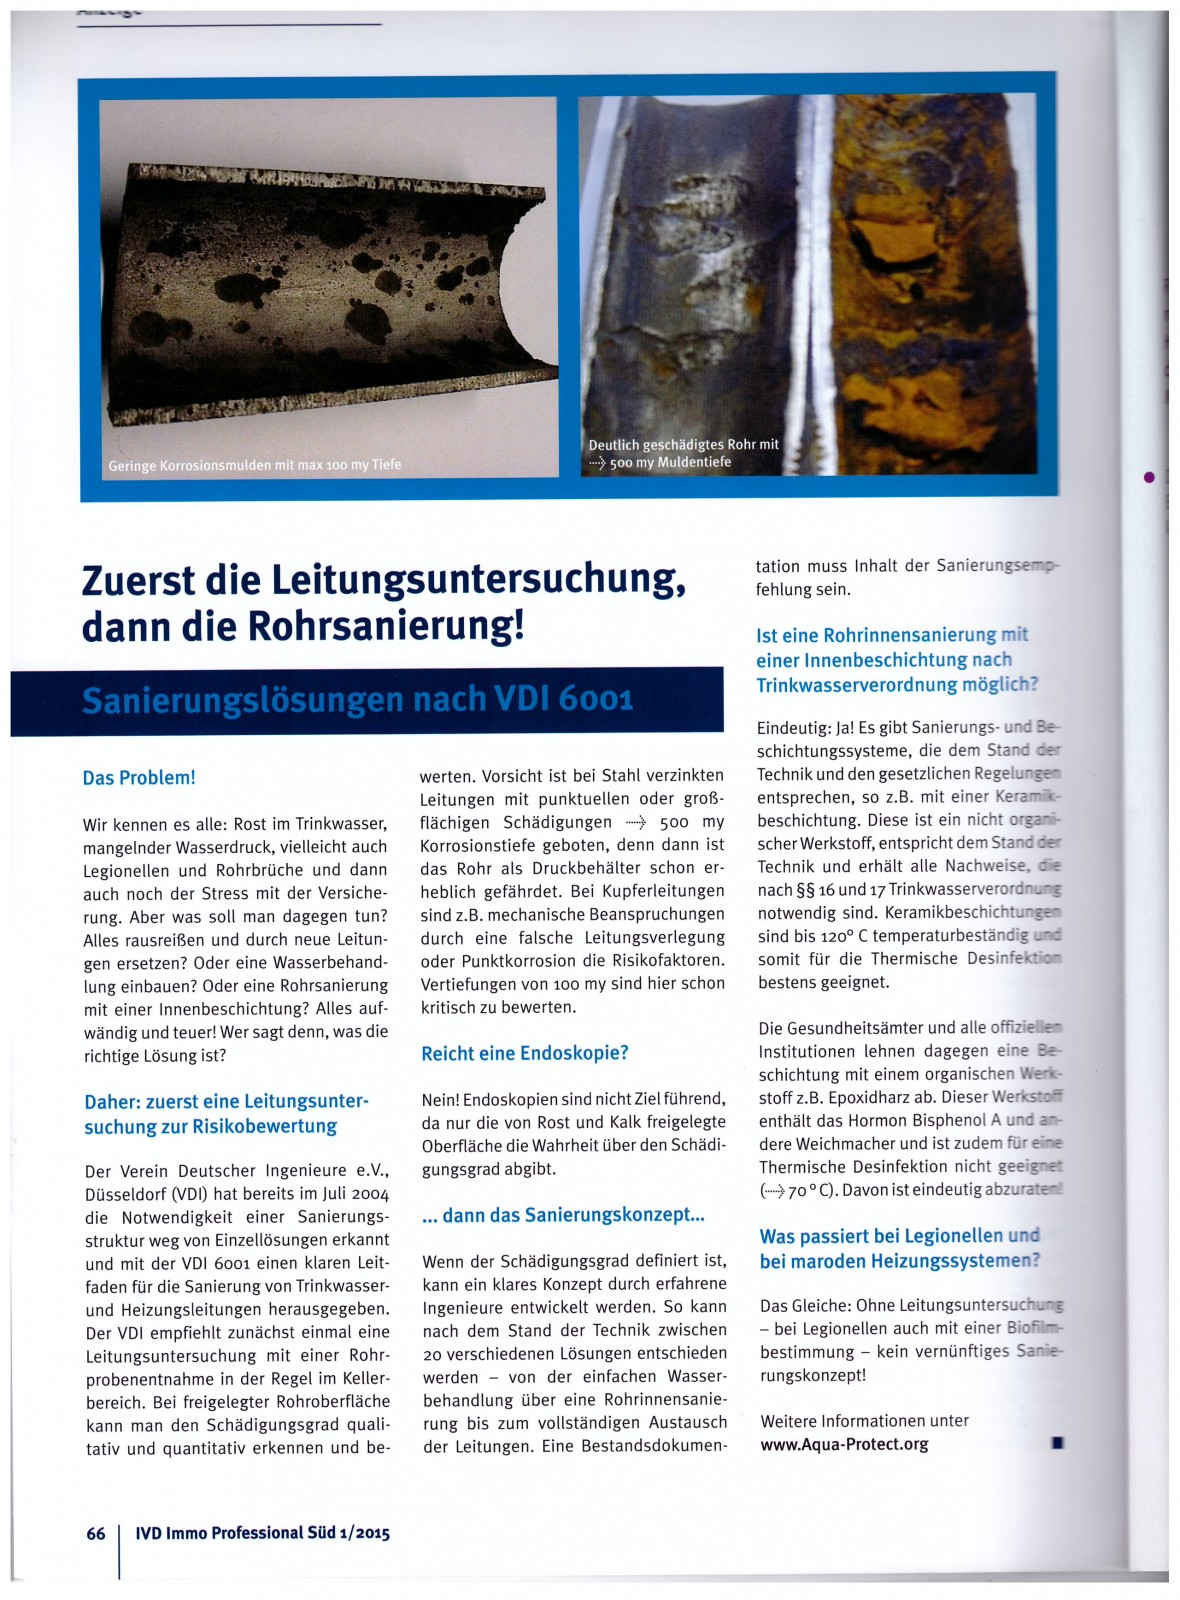 IMMO Professional - Verbandszeitschrift des IVD Süd e.V. Ausgabe 2015